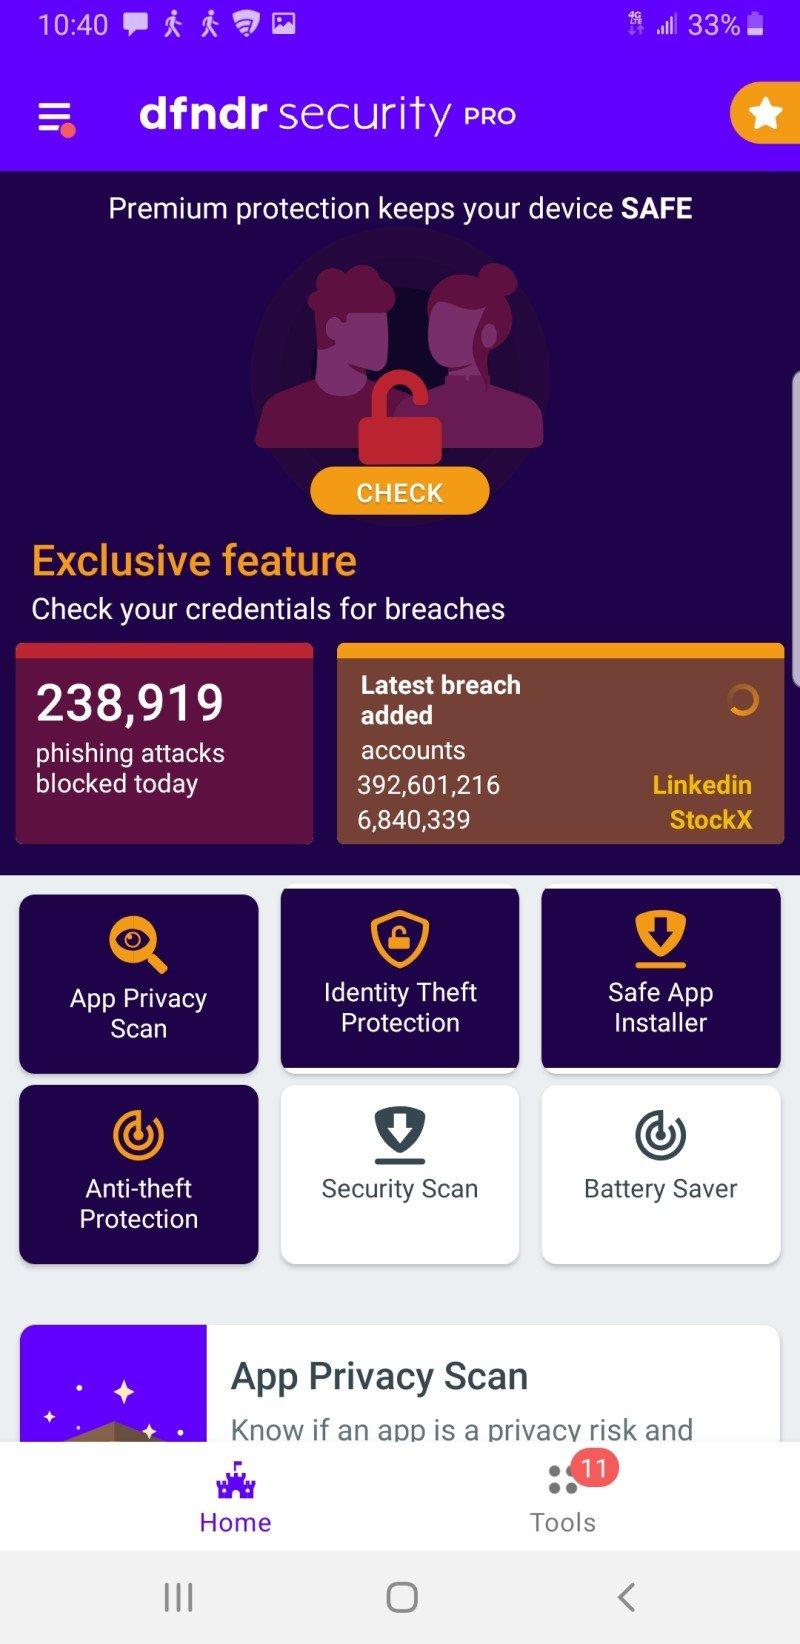 Psafe Dfndr Mobile Antivirus Screenshot Edited